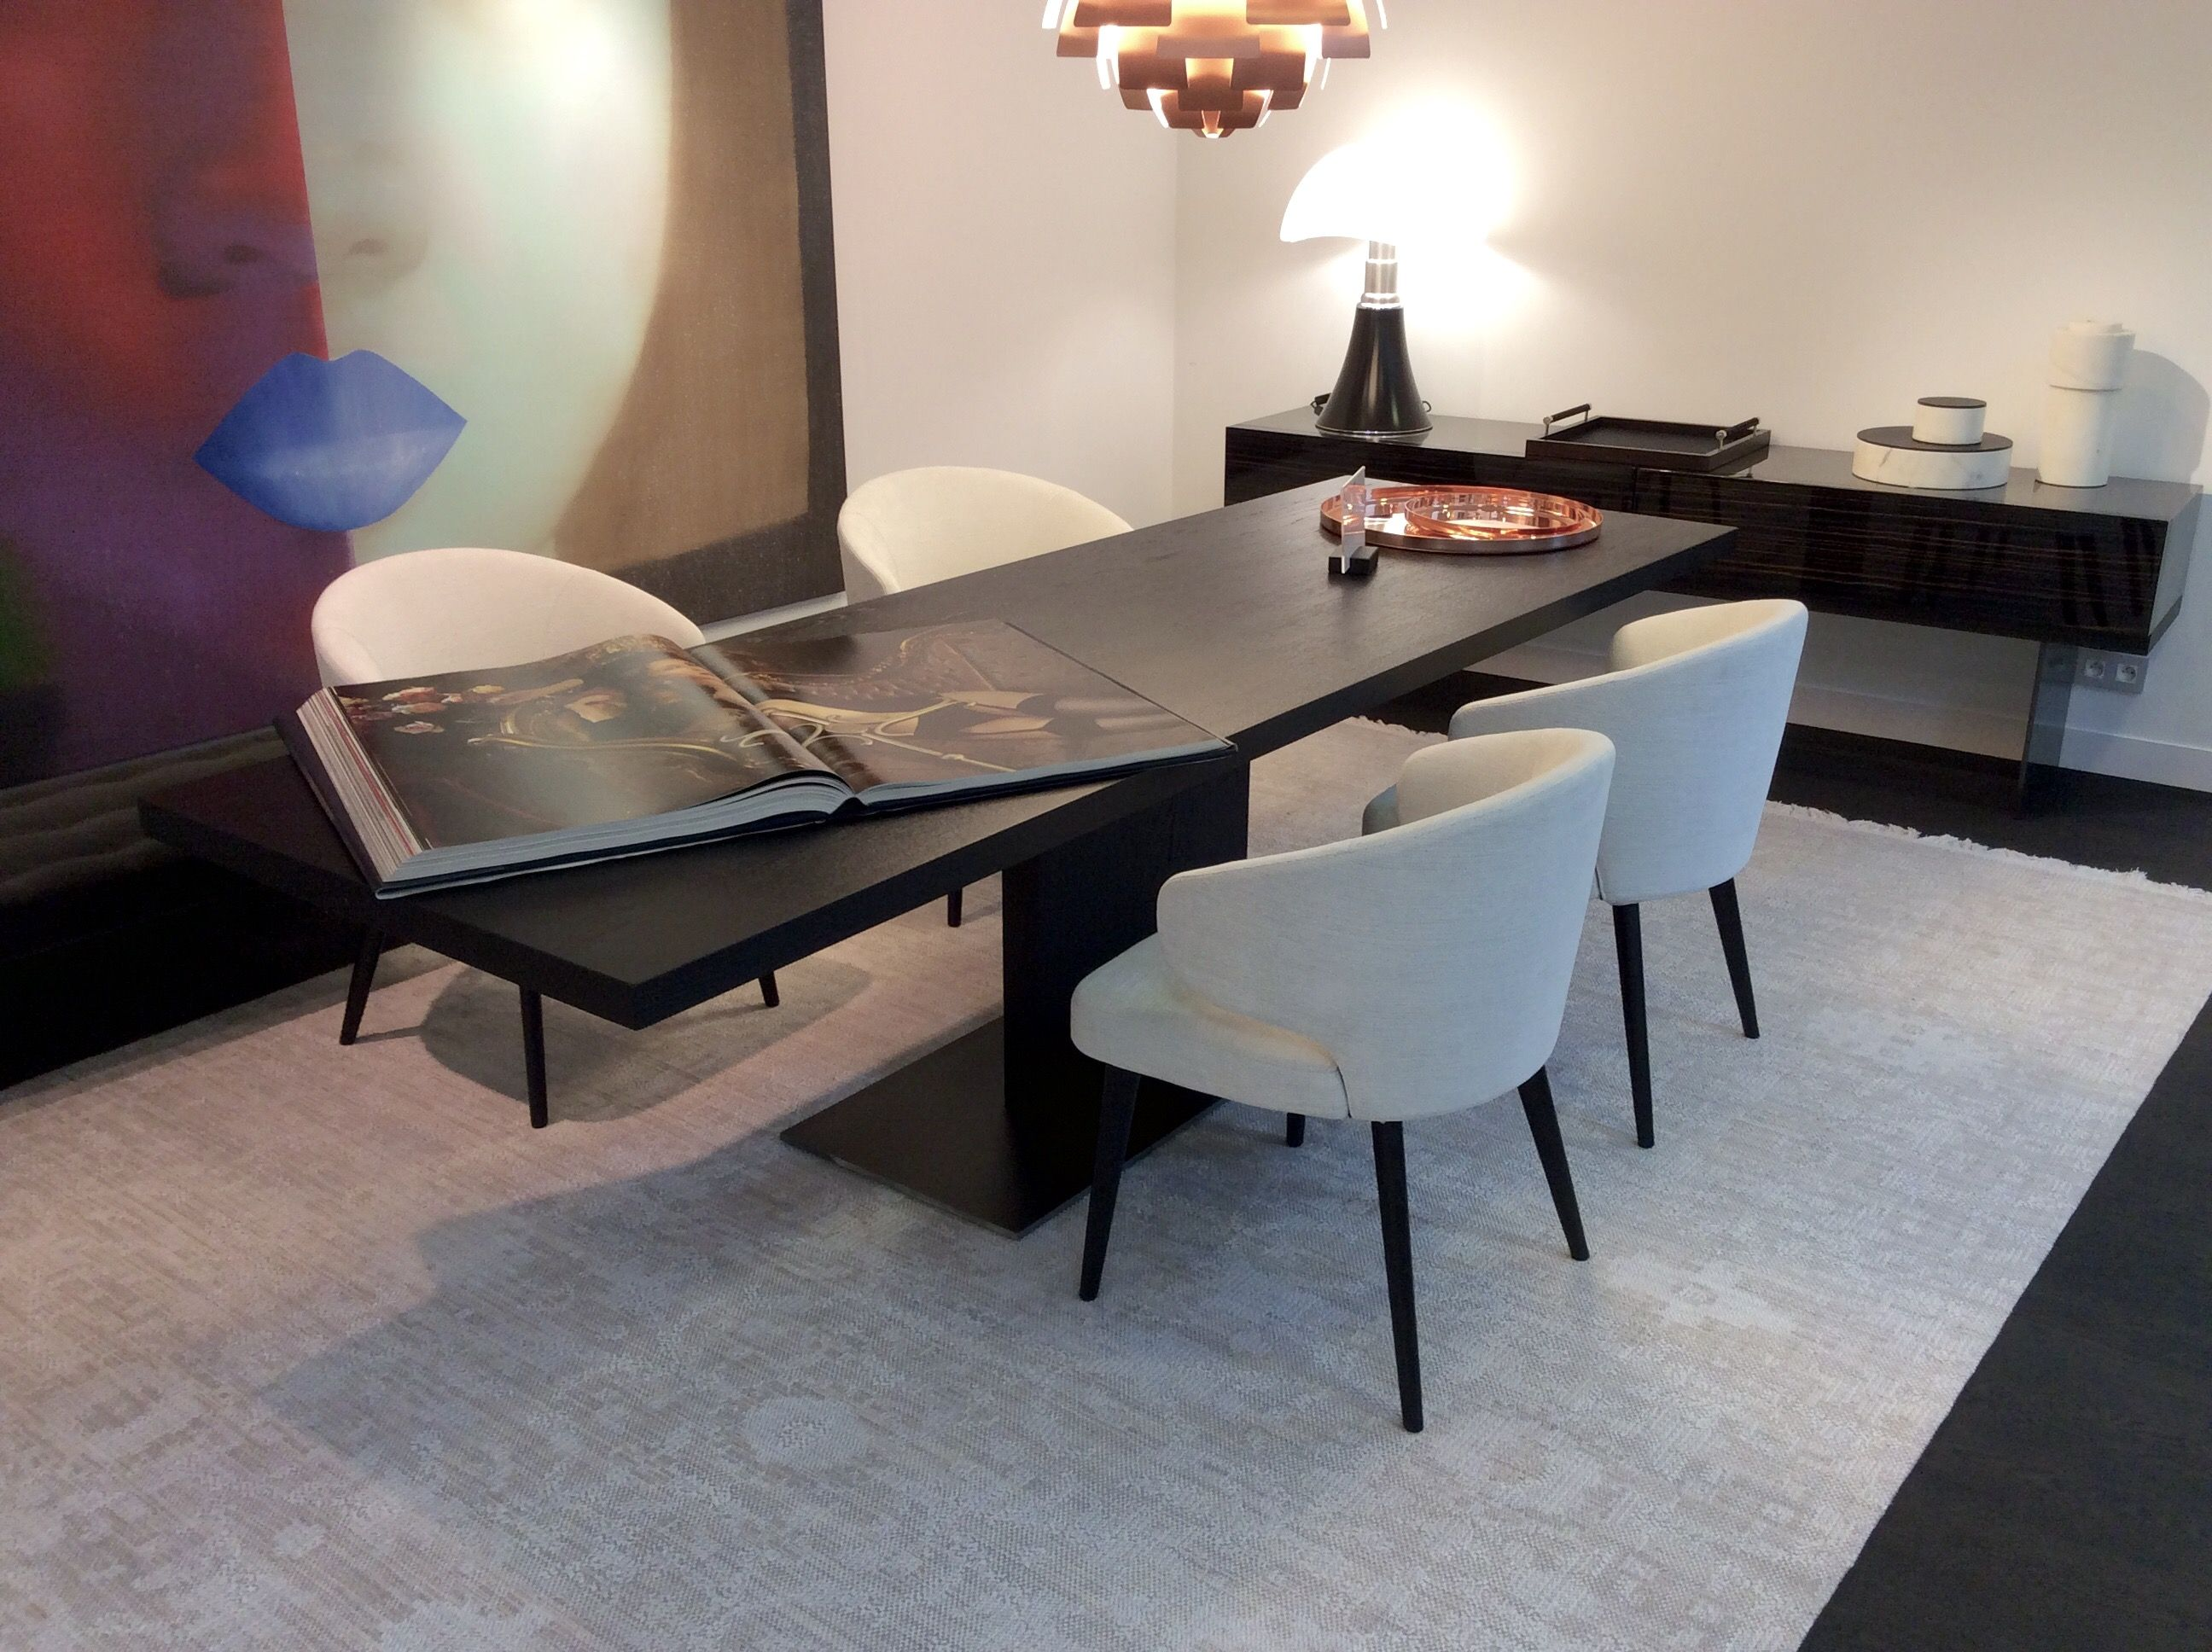 Opium dining table @ De Vos Interieur | Opium dining table / tafel ...